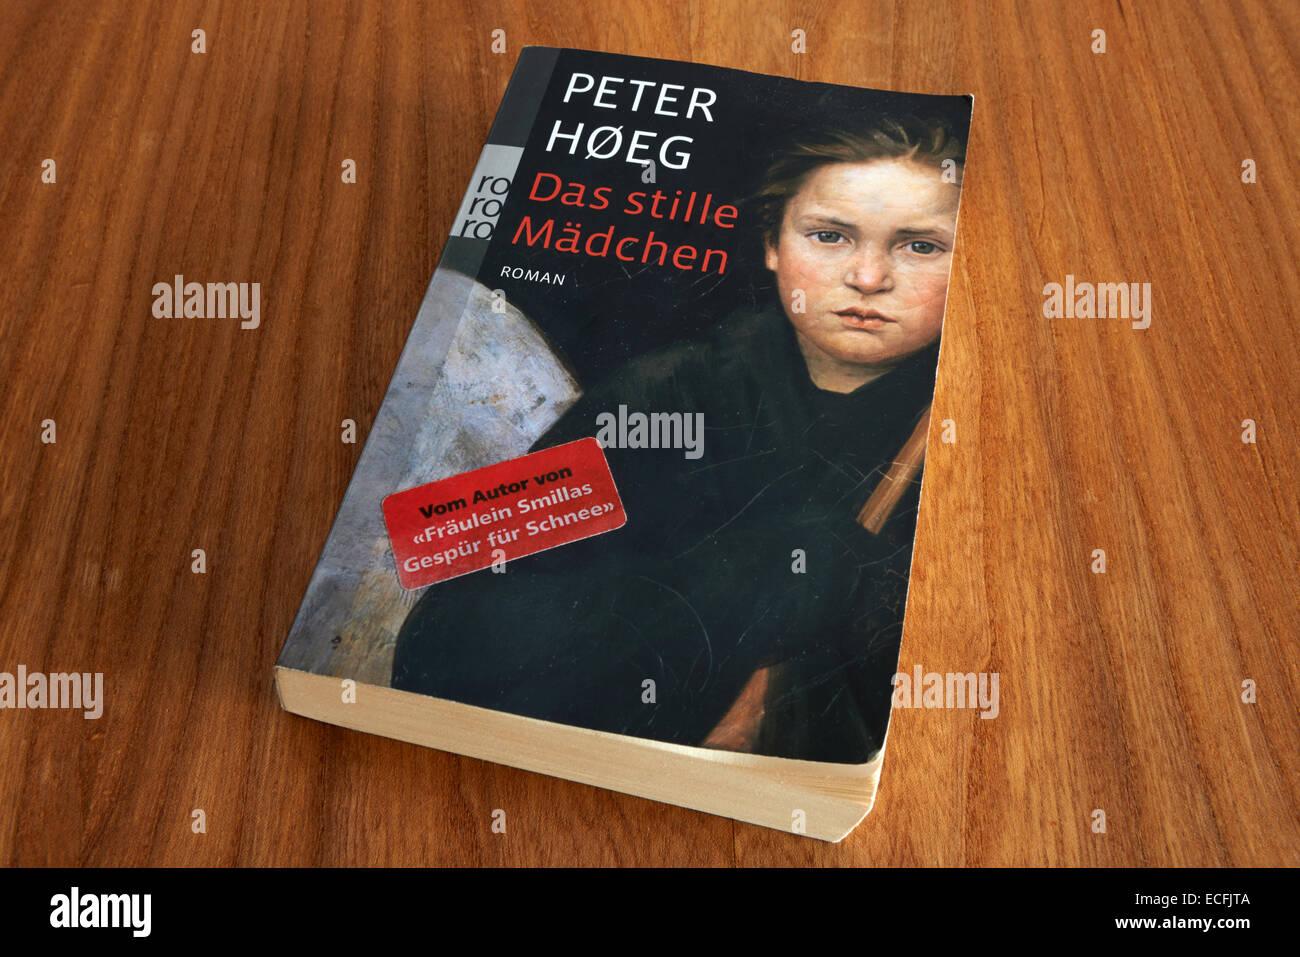 Peter Hoeg Das Stille Madchen - Stock Image